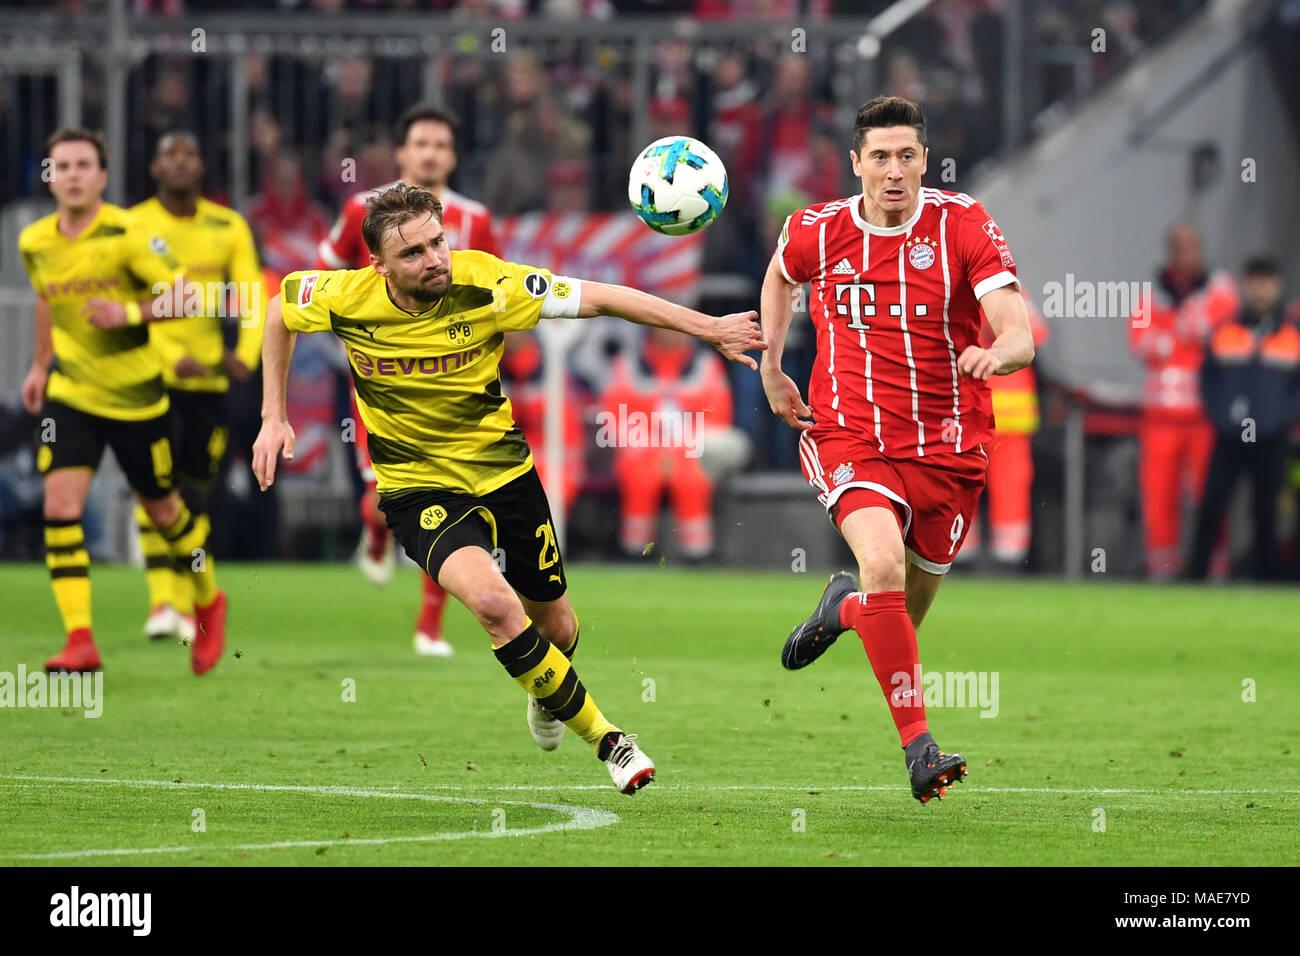 Robert Lewandowski Fc Bayern München Marcel Schmelzer Borussia